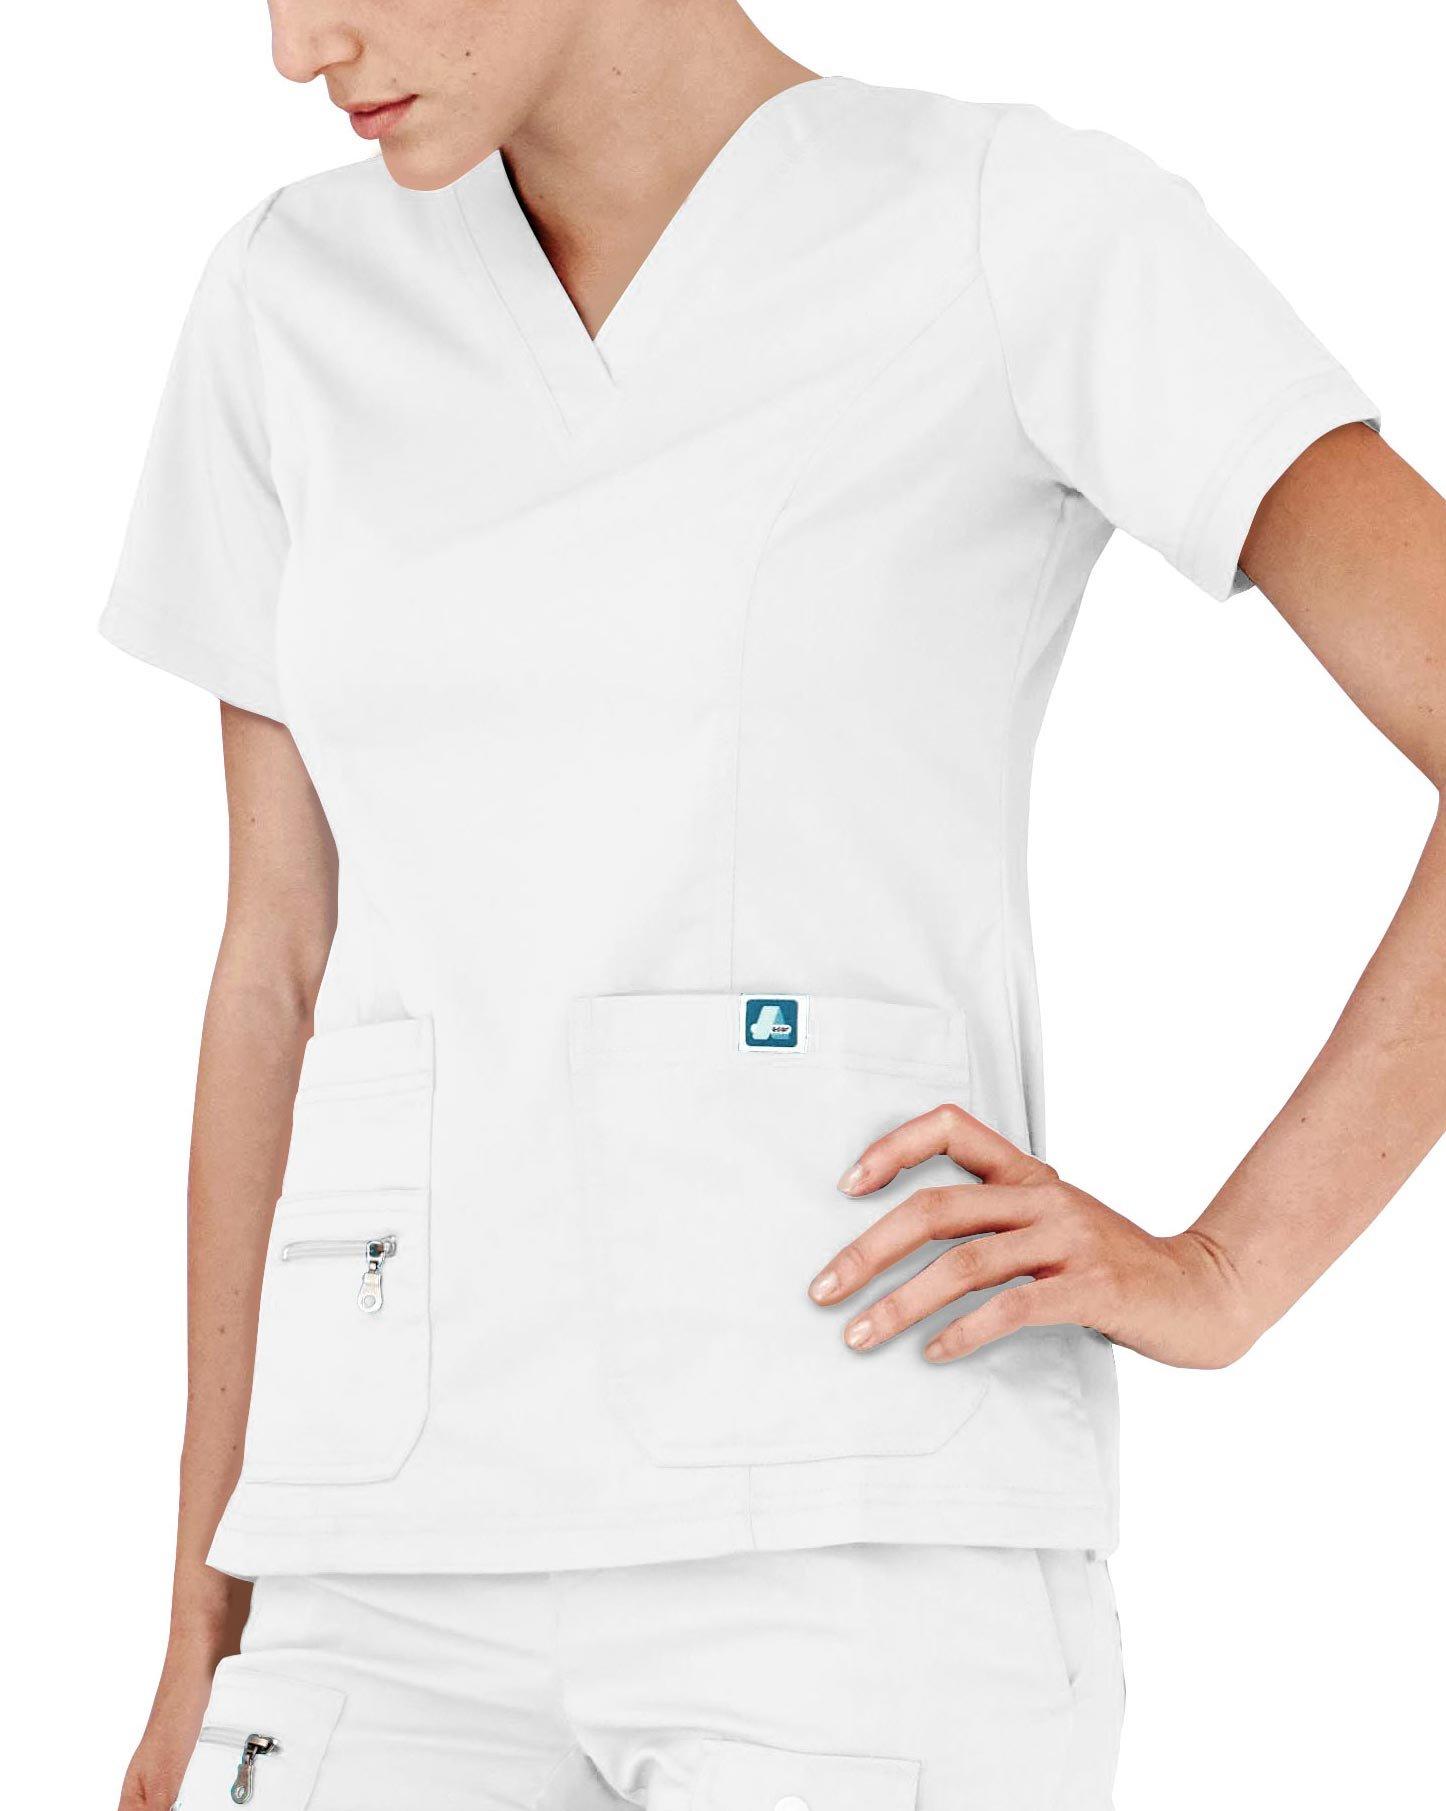 Adar Indulgence Womens Jr Fit Enhanced V-neck Scrub Top - 4212 - White - M